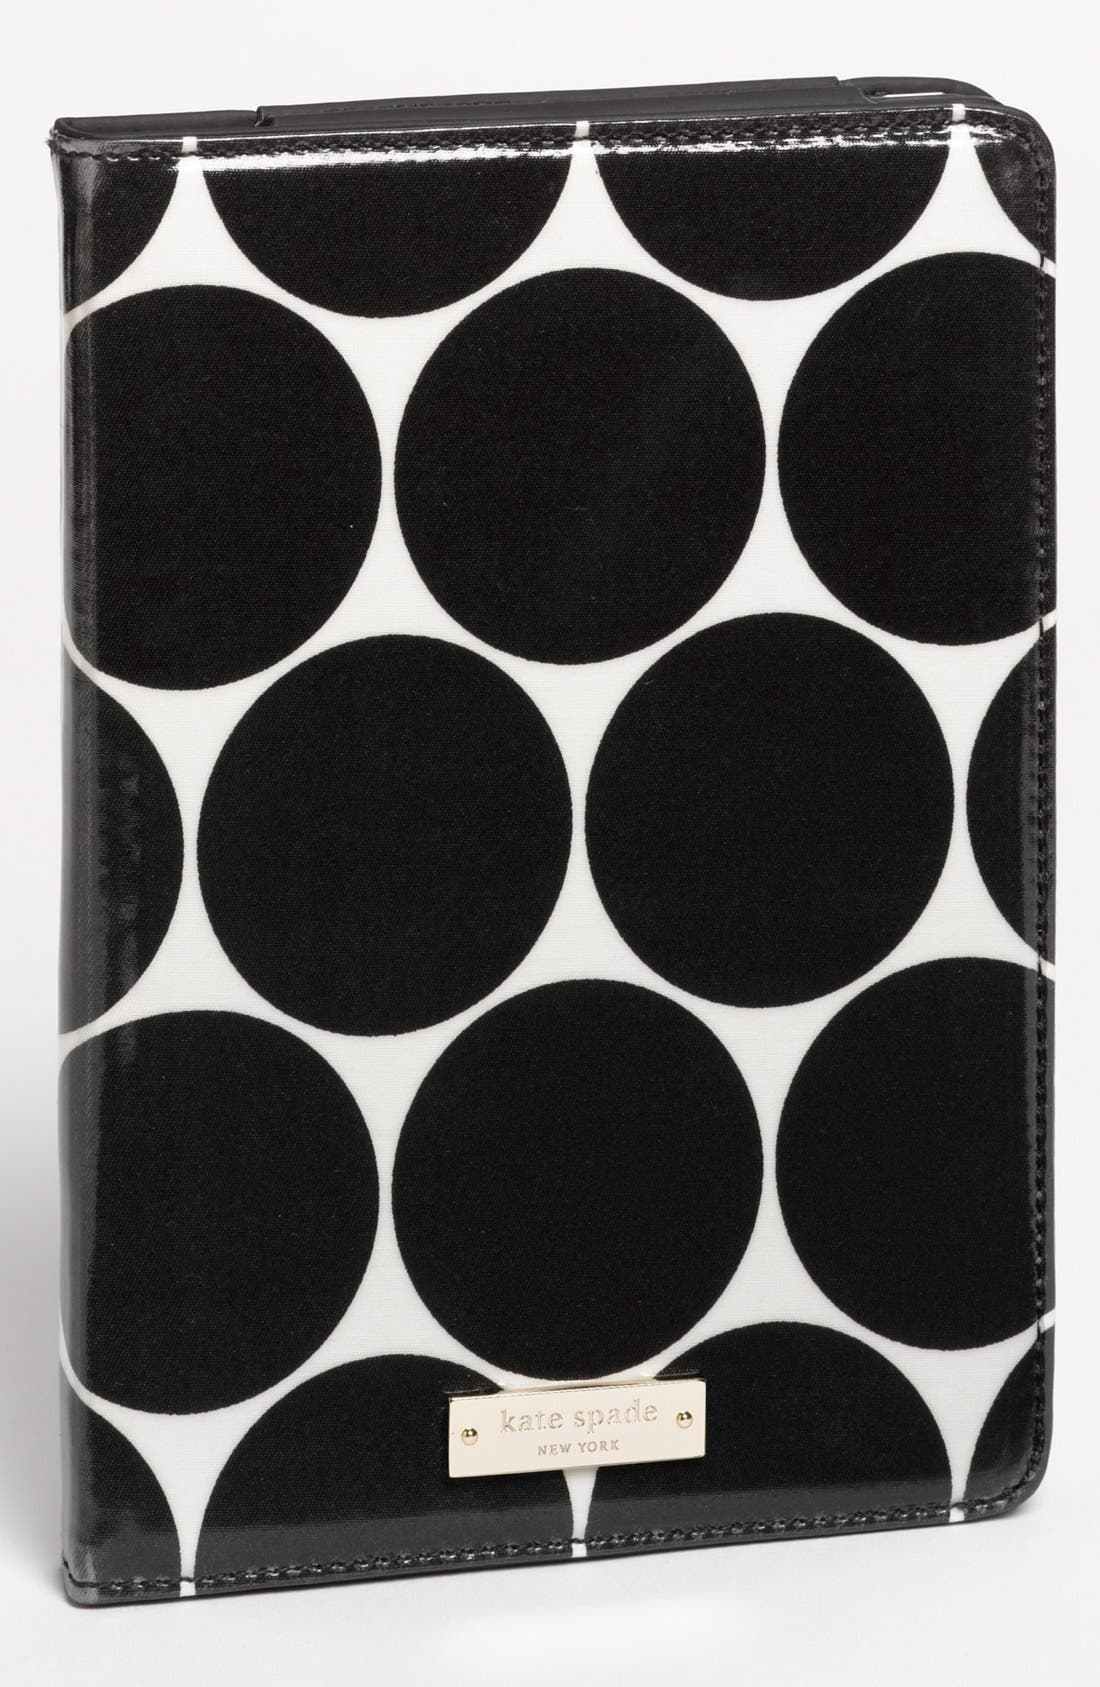 Main Image - kate spade new york 'deborah dot' iPad mini™ folio